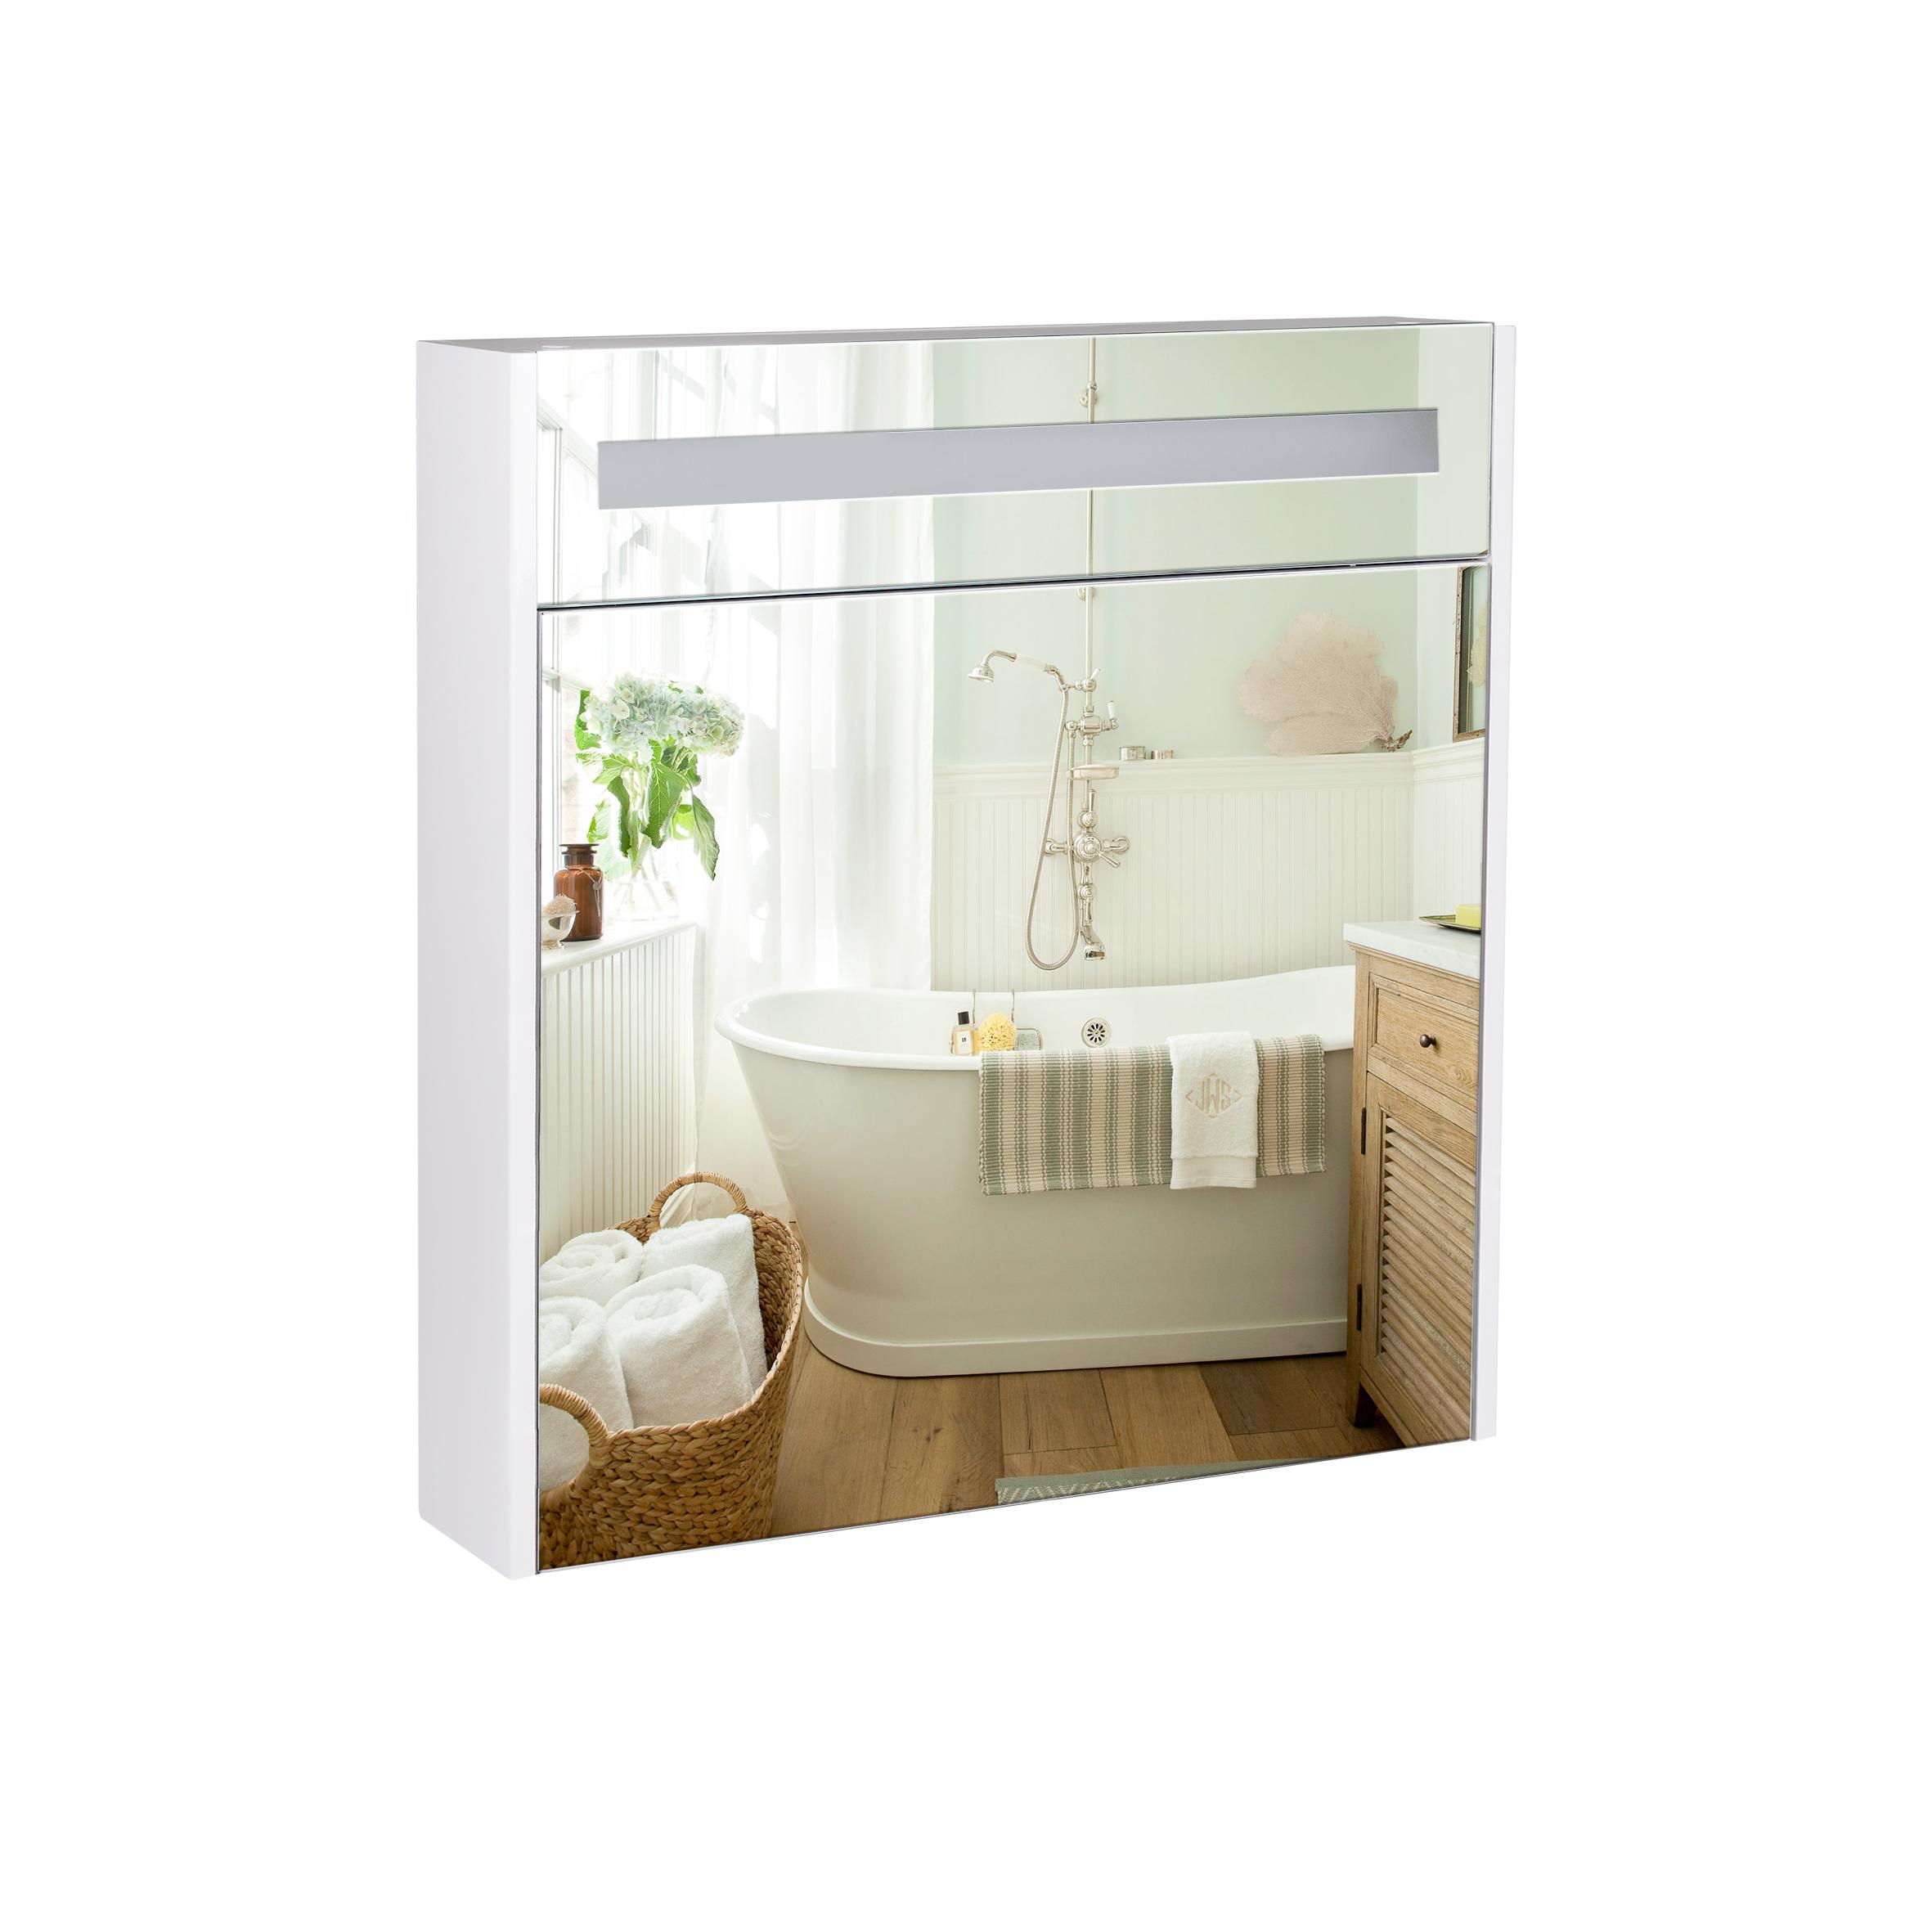 Зеркальный шкаф подвесной Qtap Robin 700х730х145 White с LED-подсветкой QT1377ZP7001W